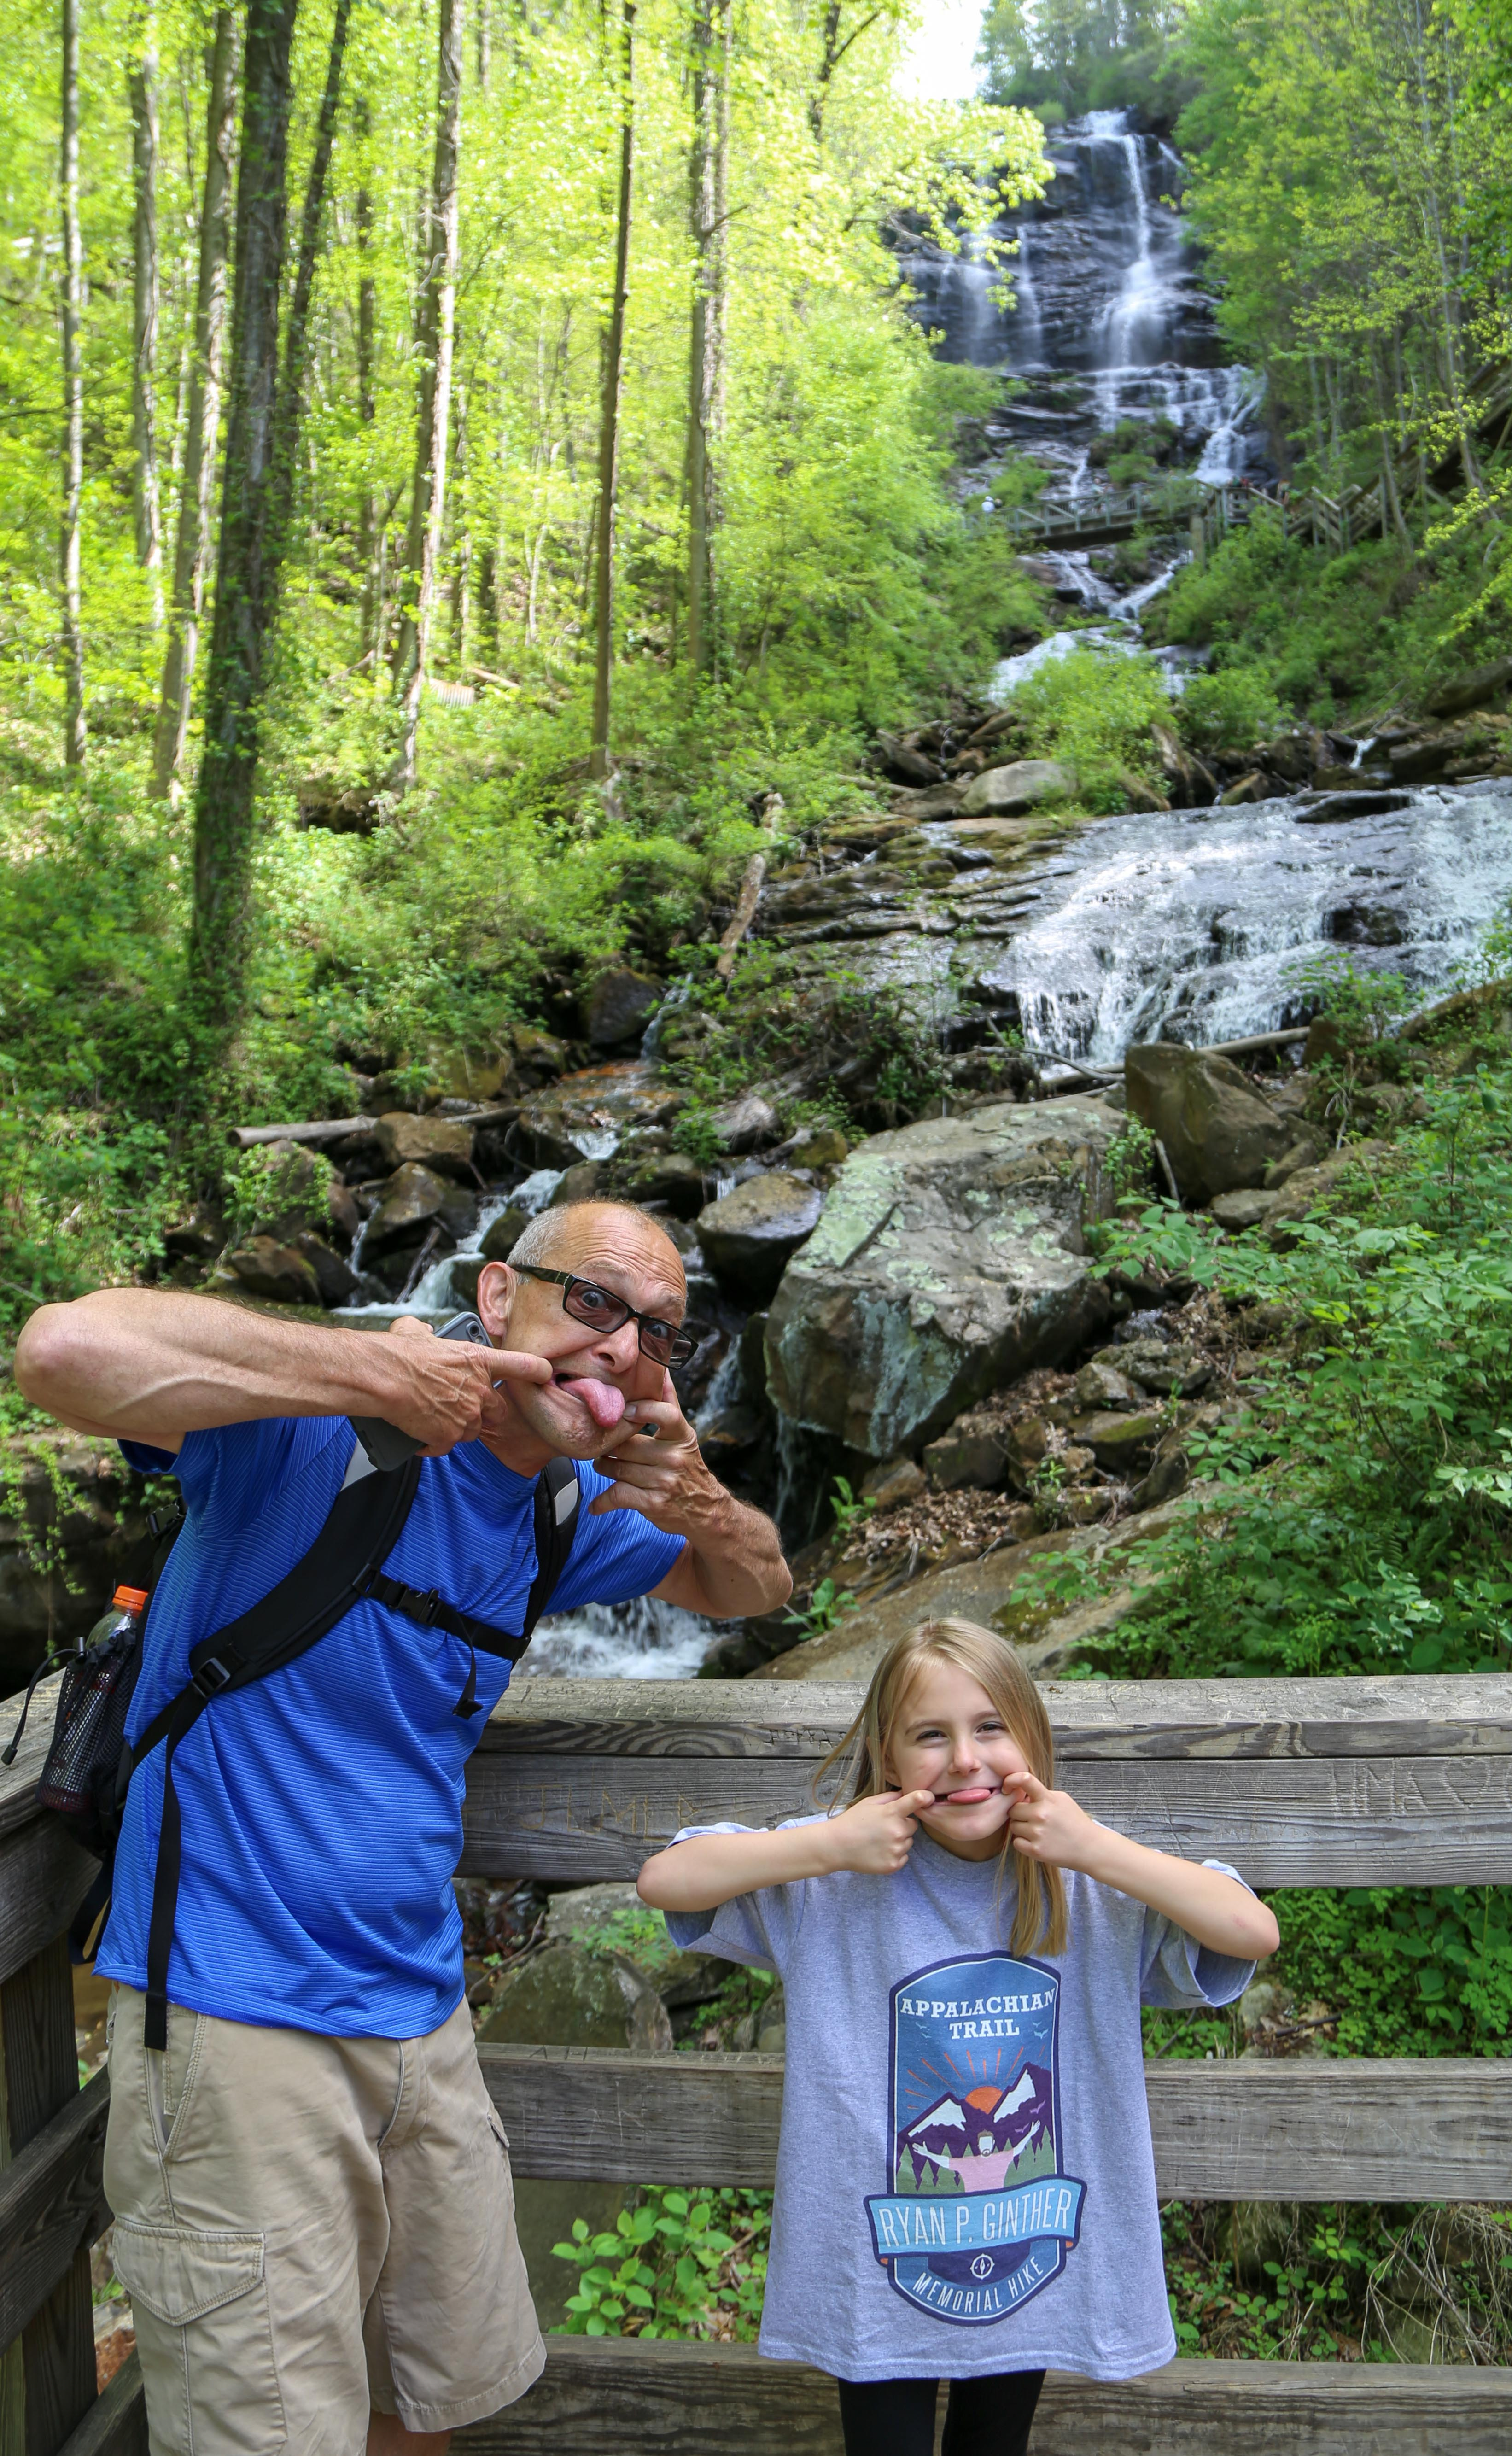 Ryan P. Ginther Memorial Hike-4